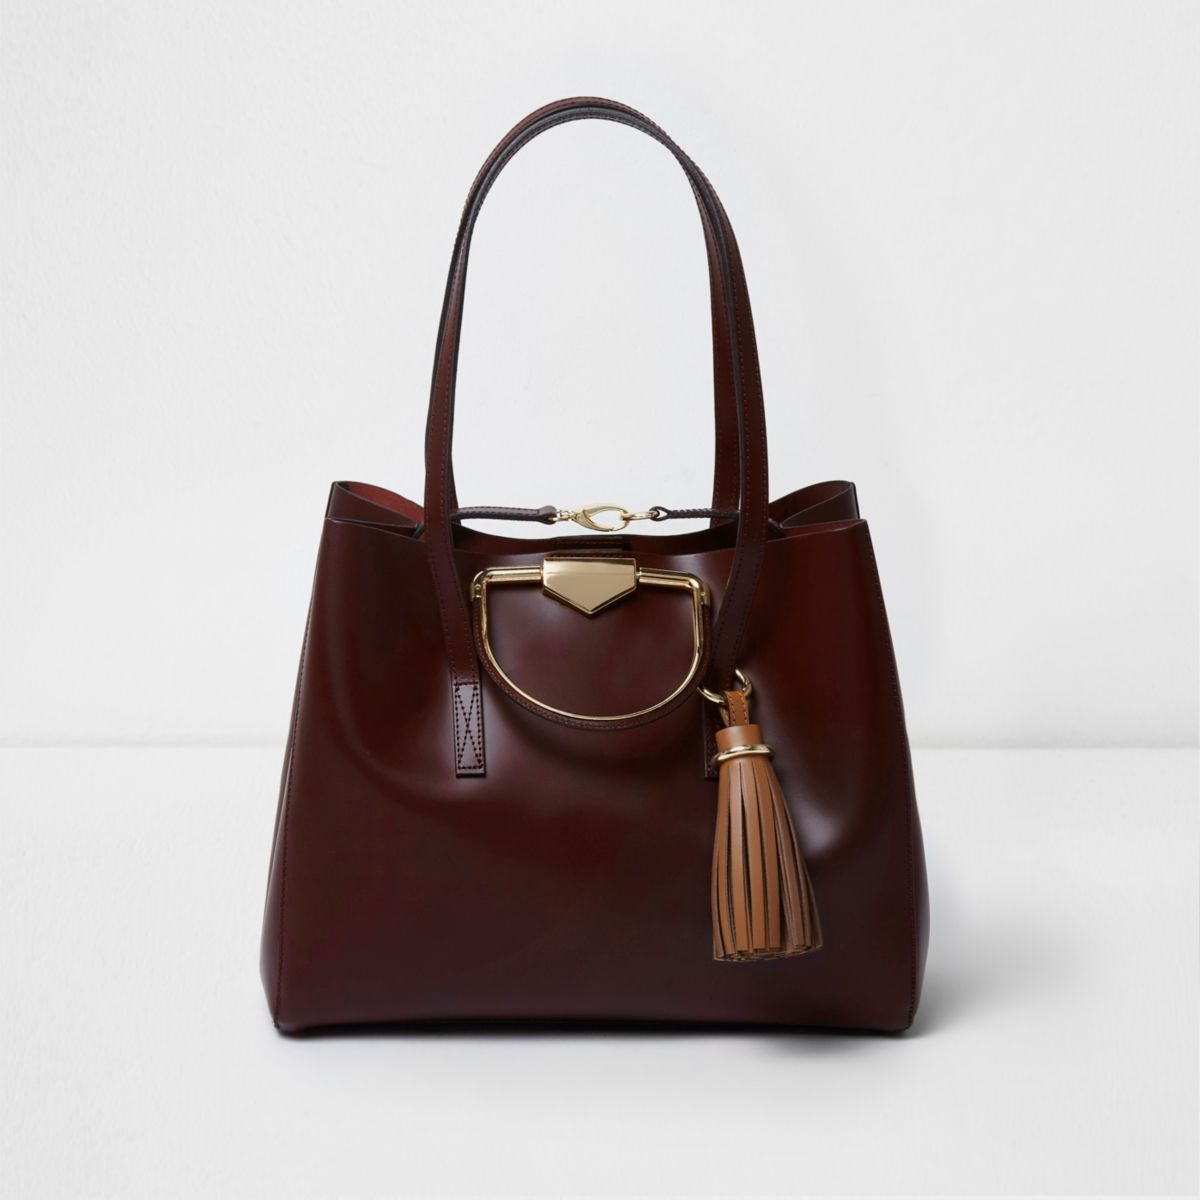 Burgundy leather metal handle large tote bag